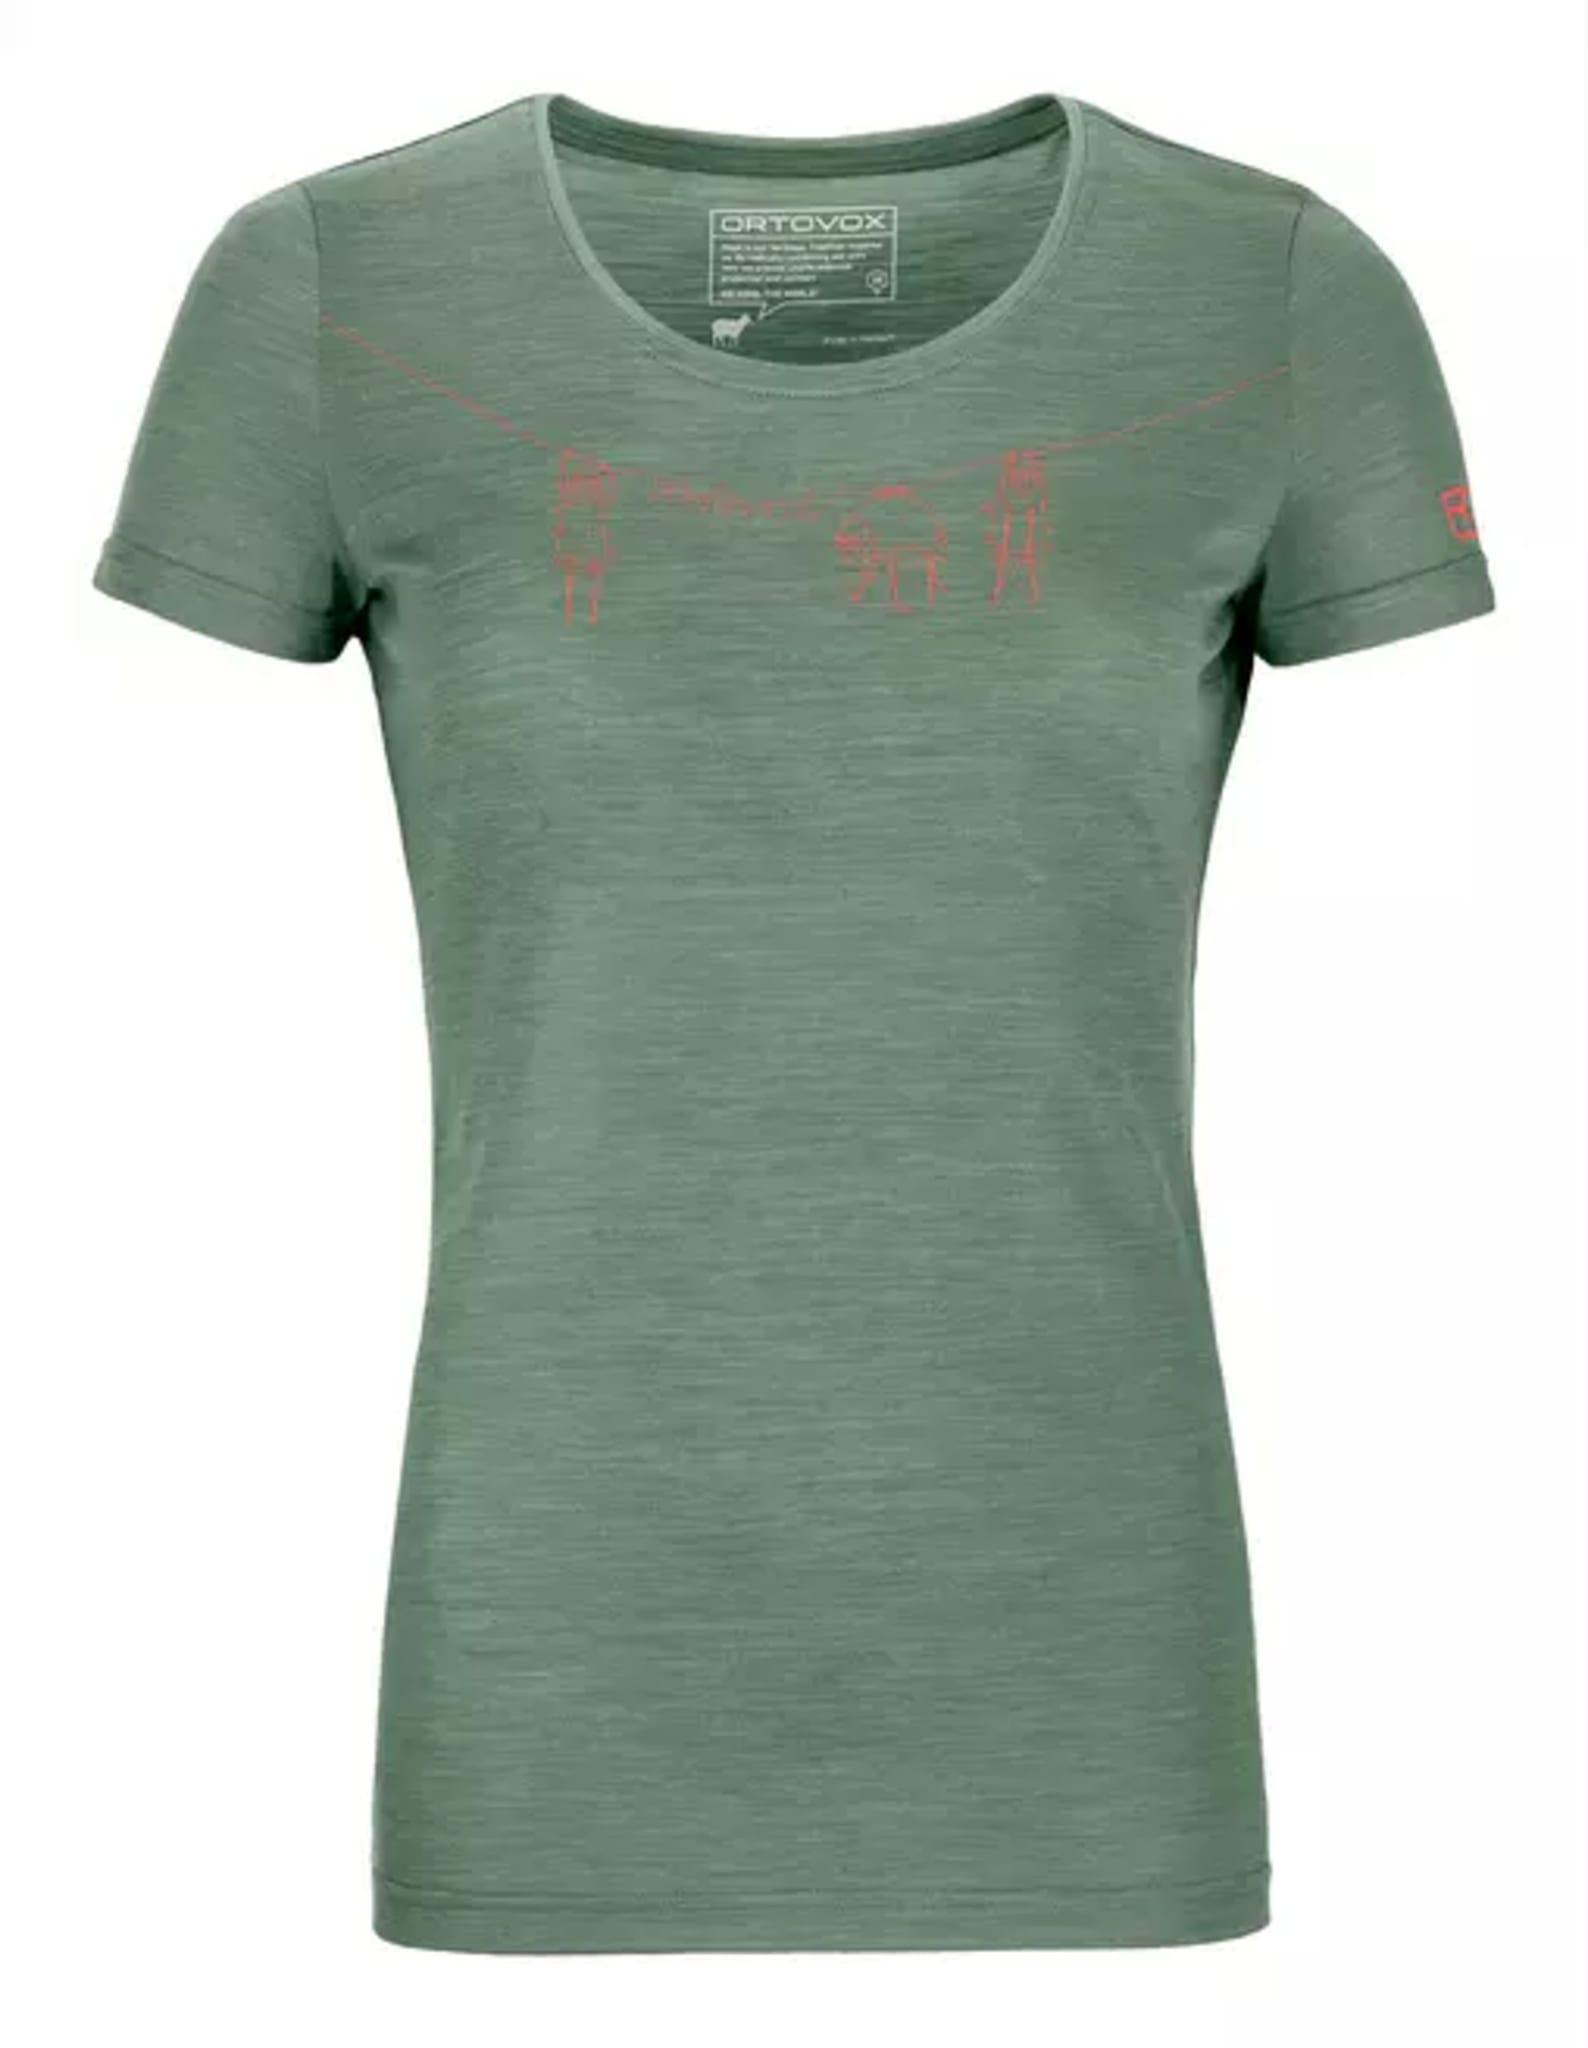 120 Cool Tec Wool Wash T-Shirt Ws